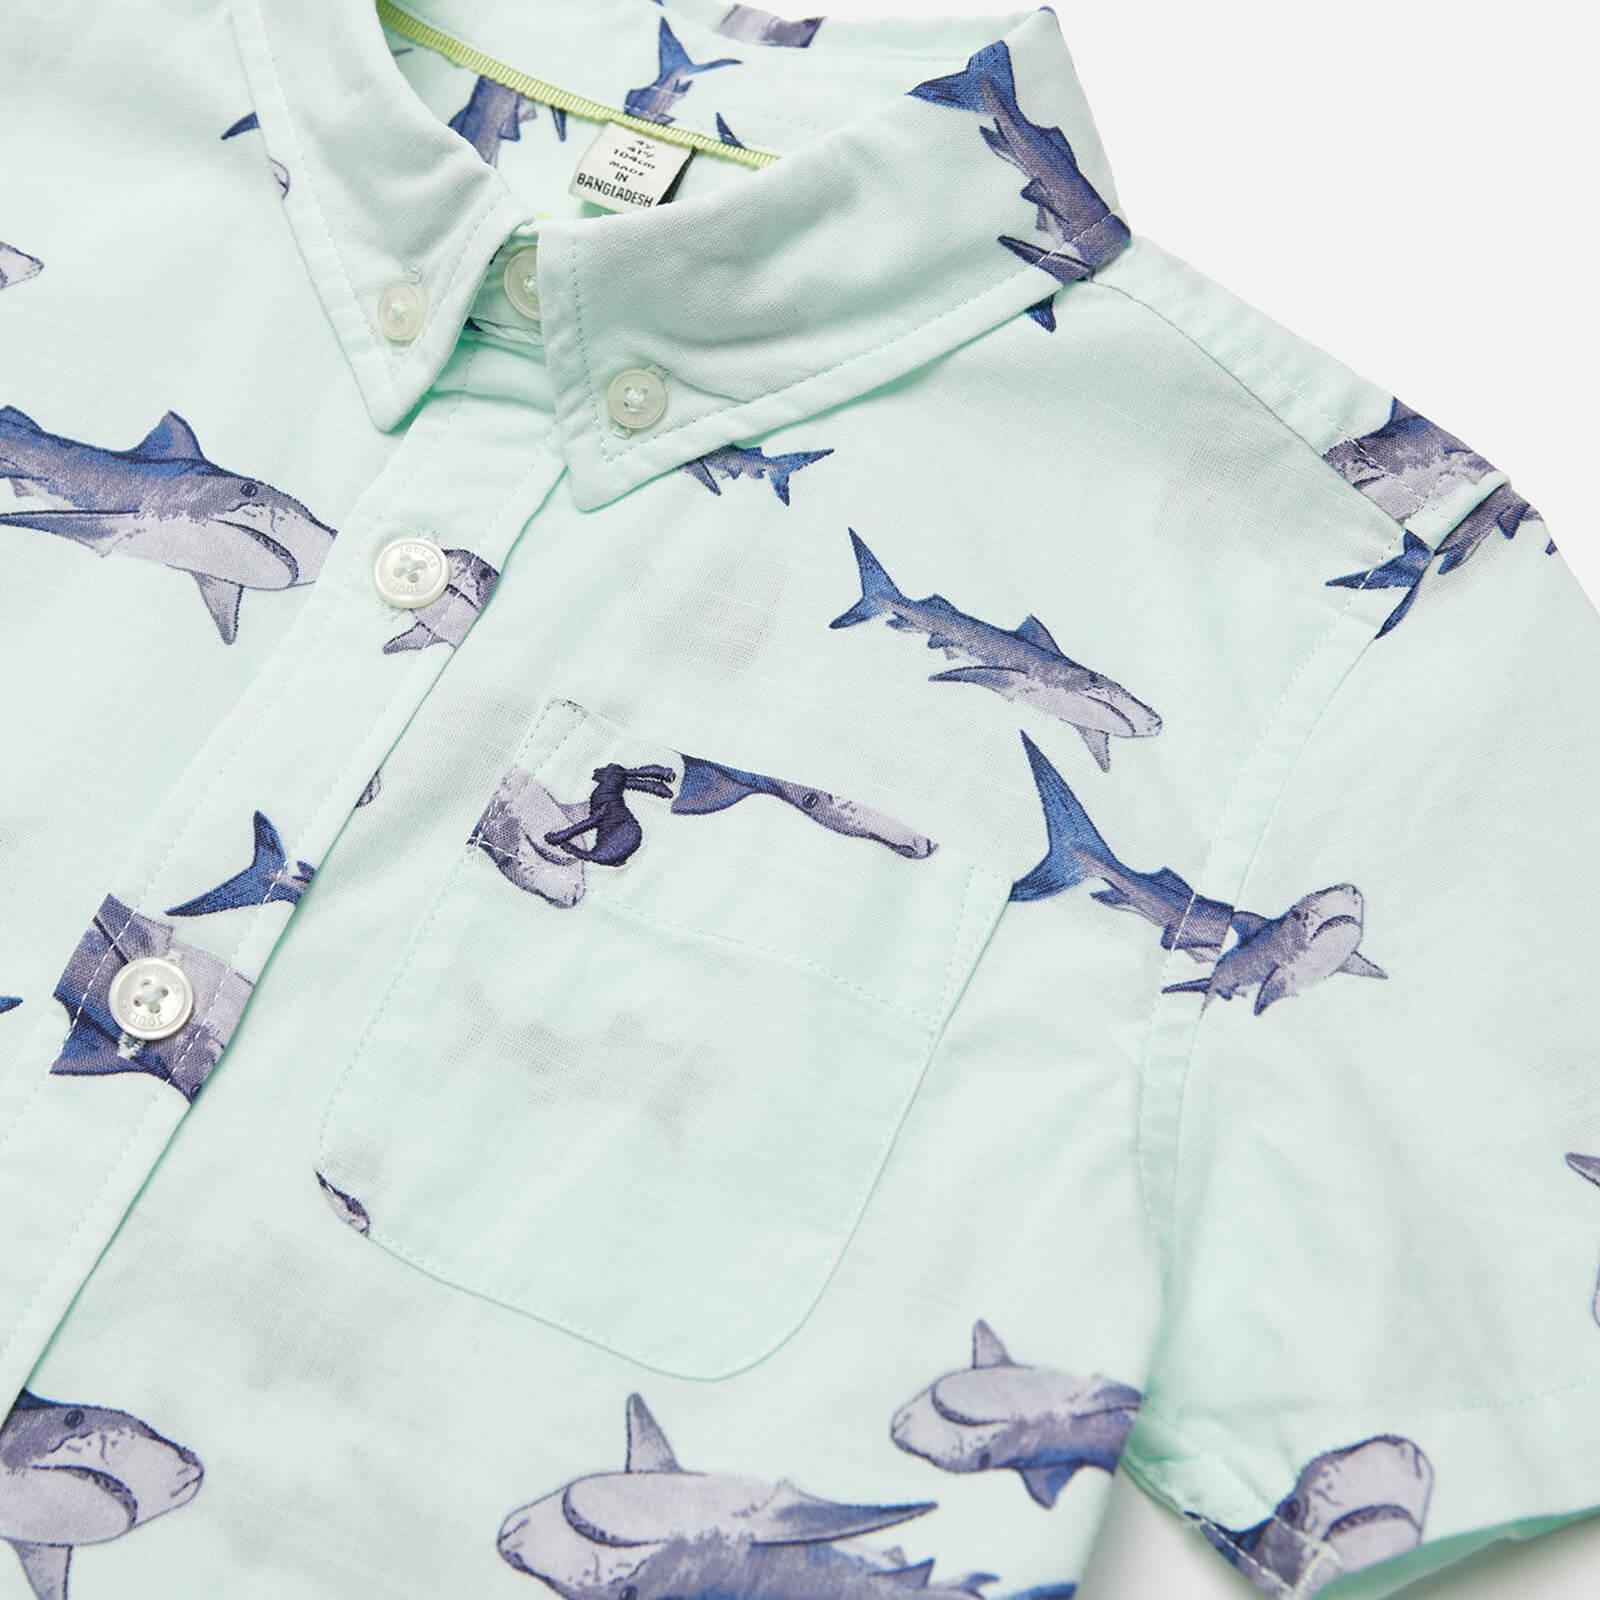 Joules Boys' Sefton Shirt - Green Sharks - 2 Years 211938 Grensharks Childrens Clothing, Green